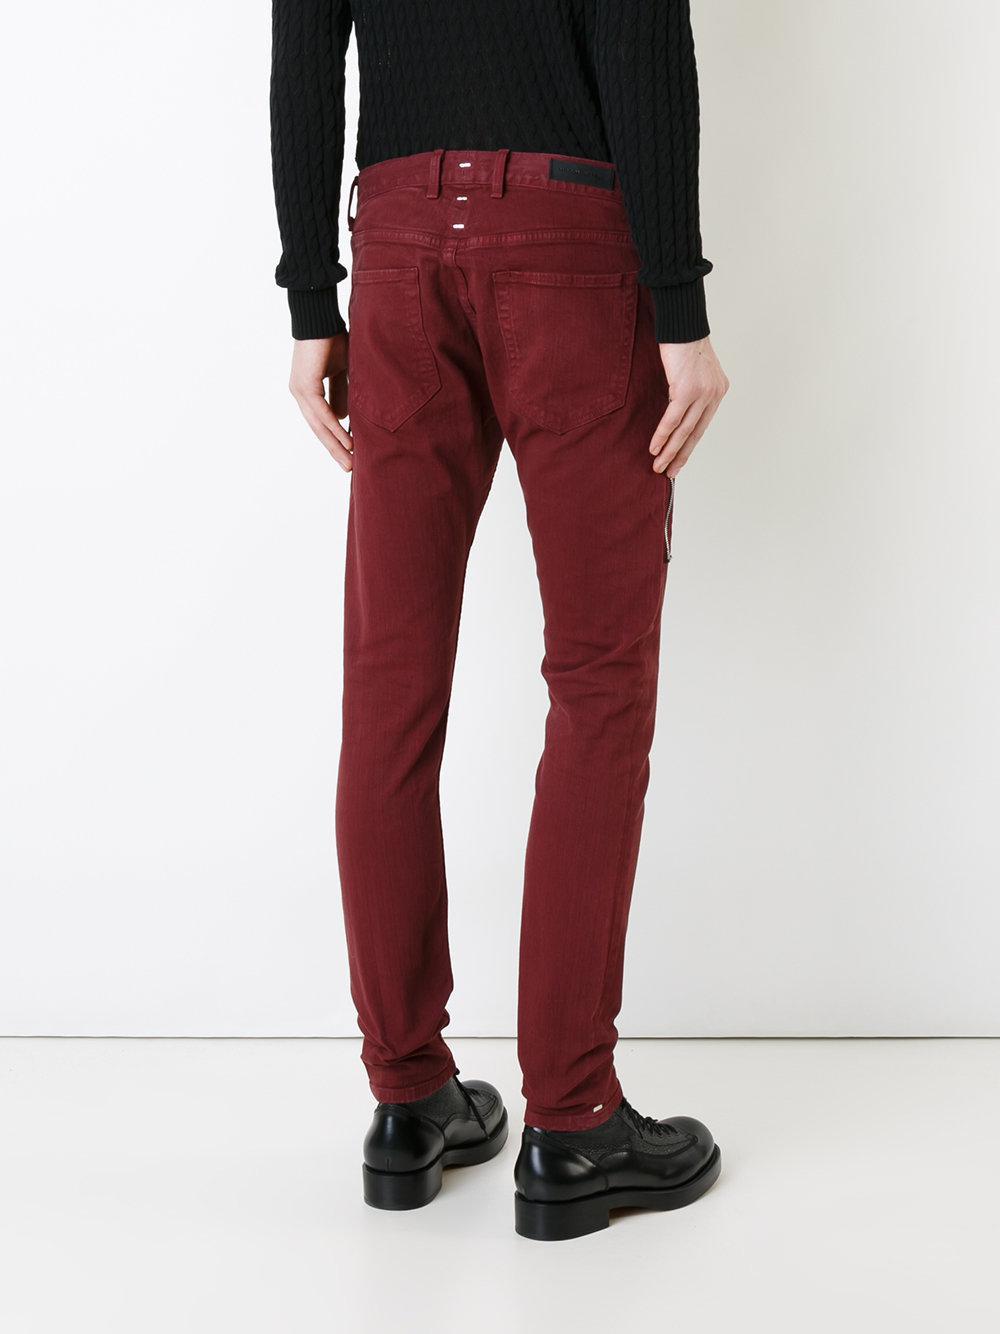 Mr Completely Super Skinny Jeans In Red For Men Lyst